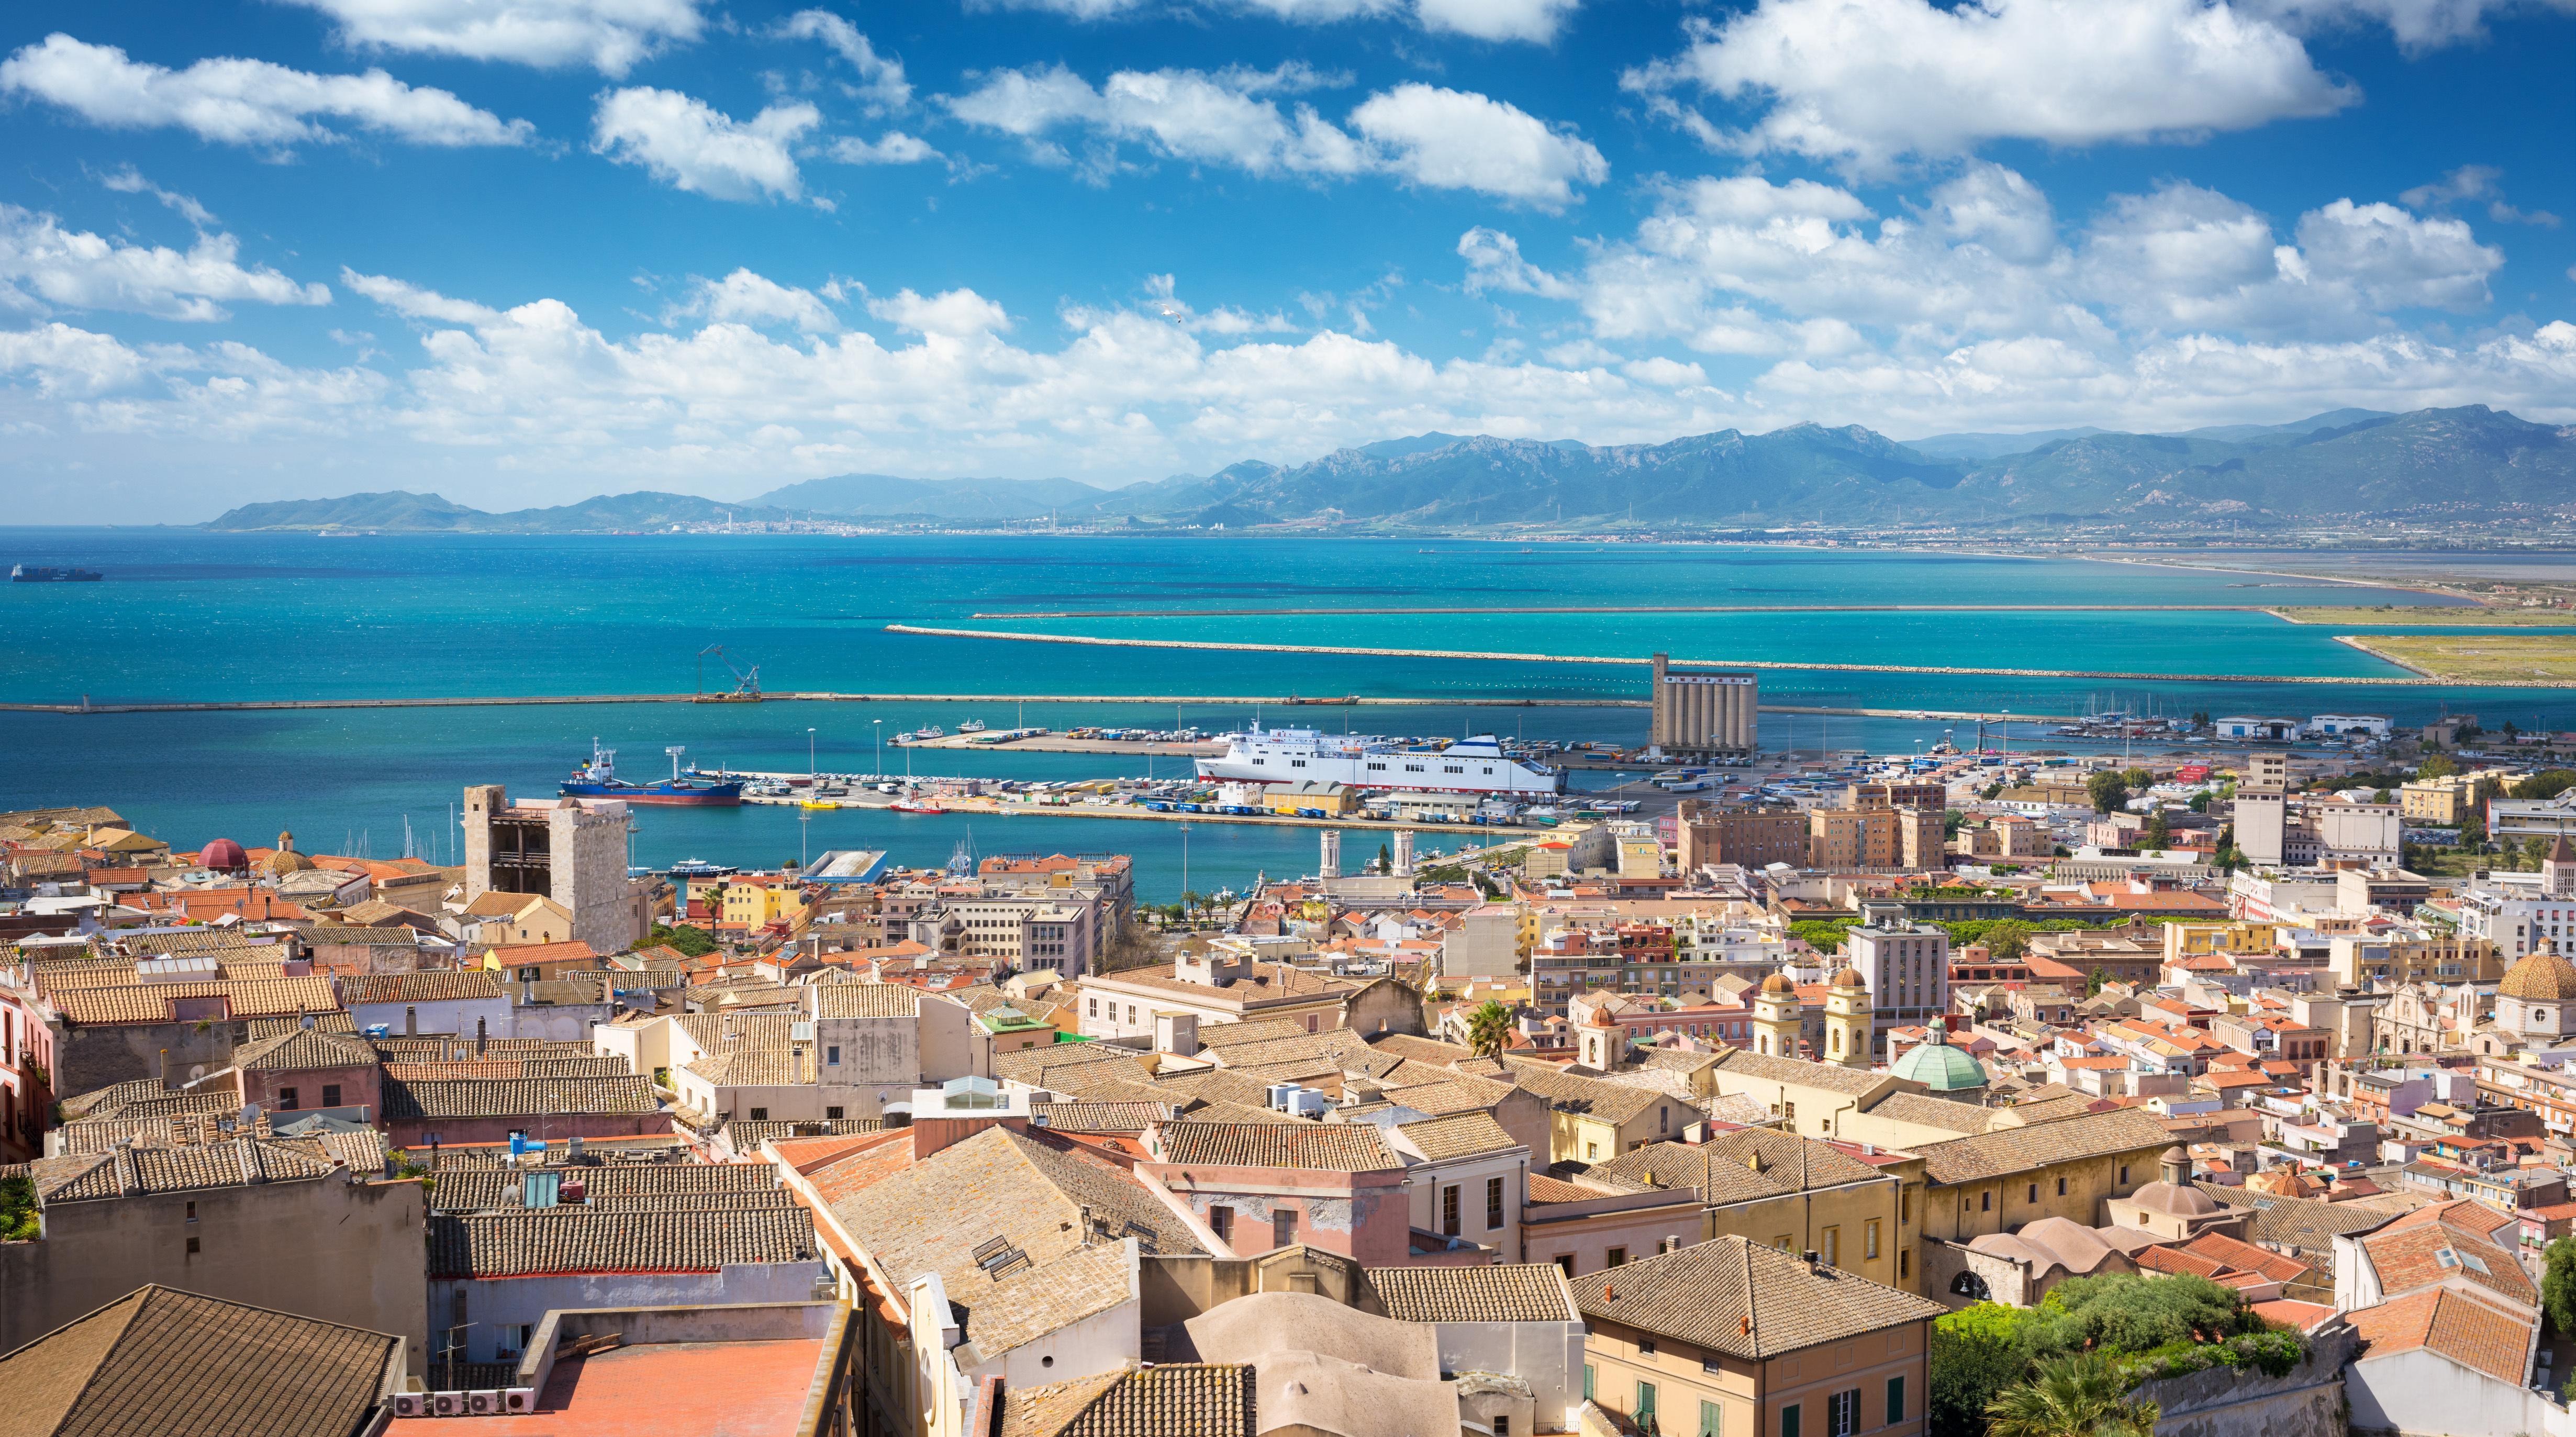 How to Spend 3 Days in Cagliari